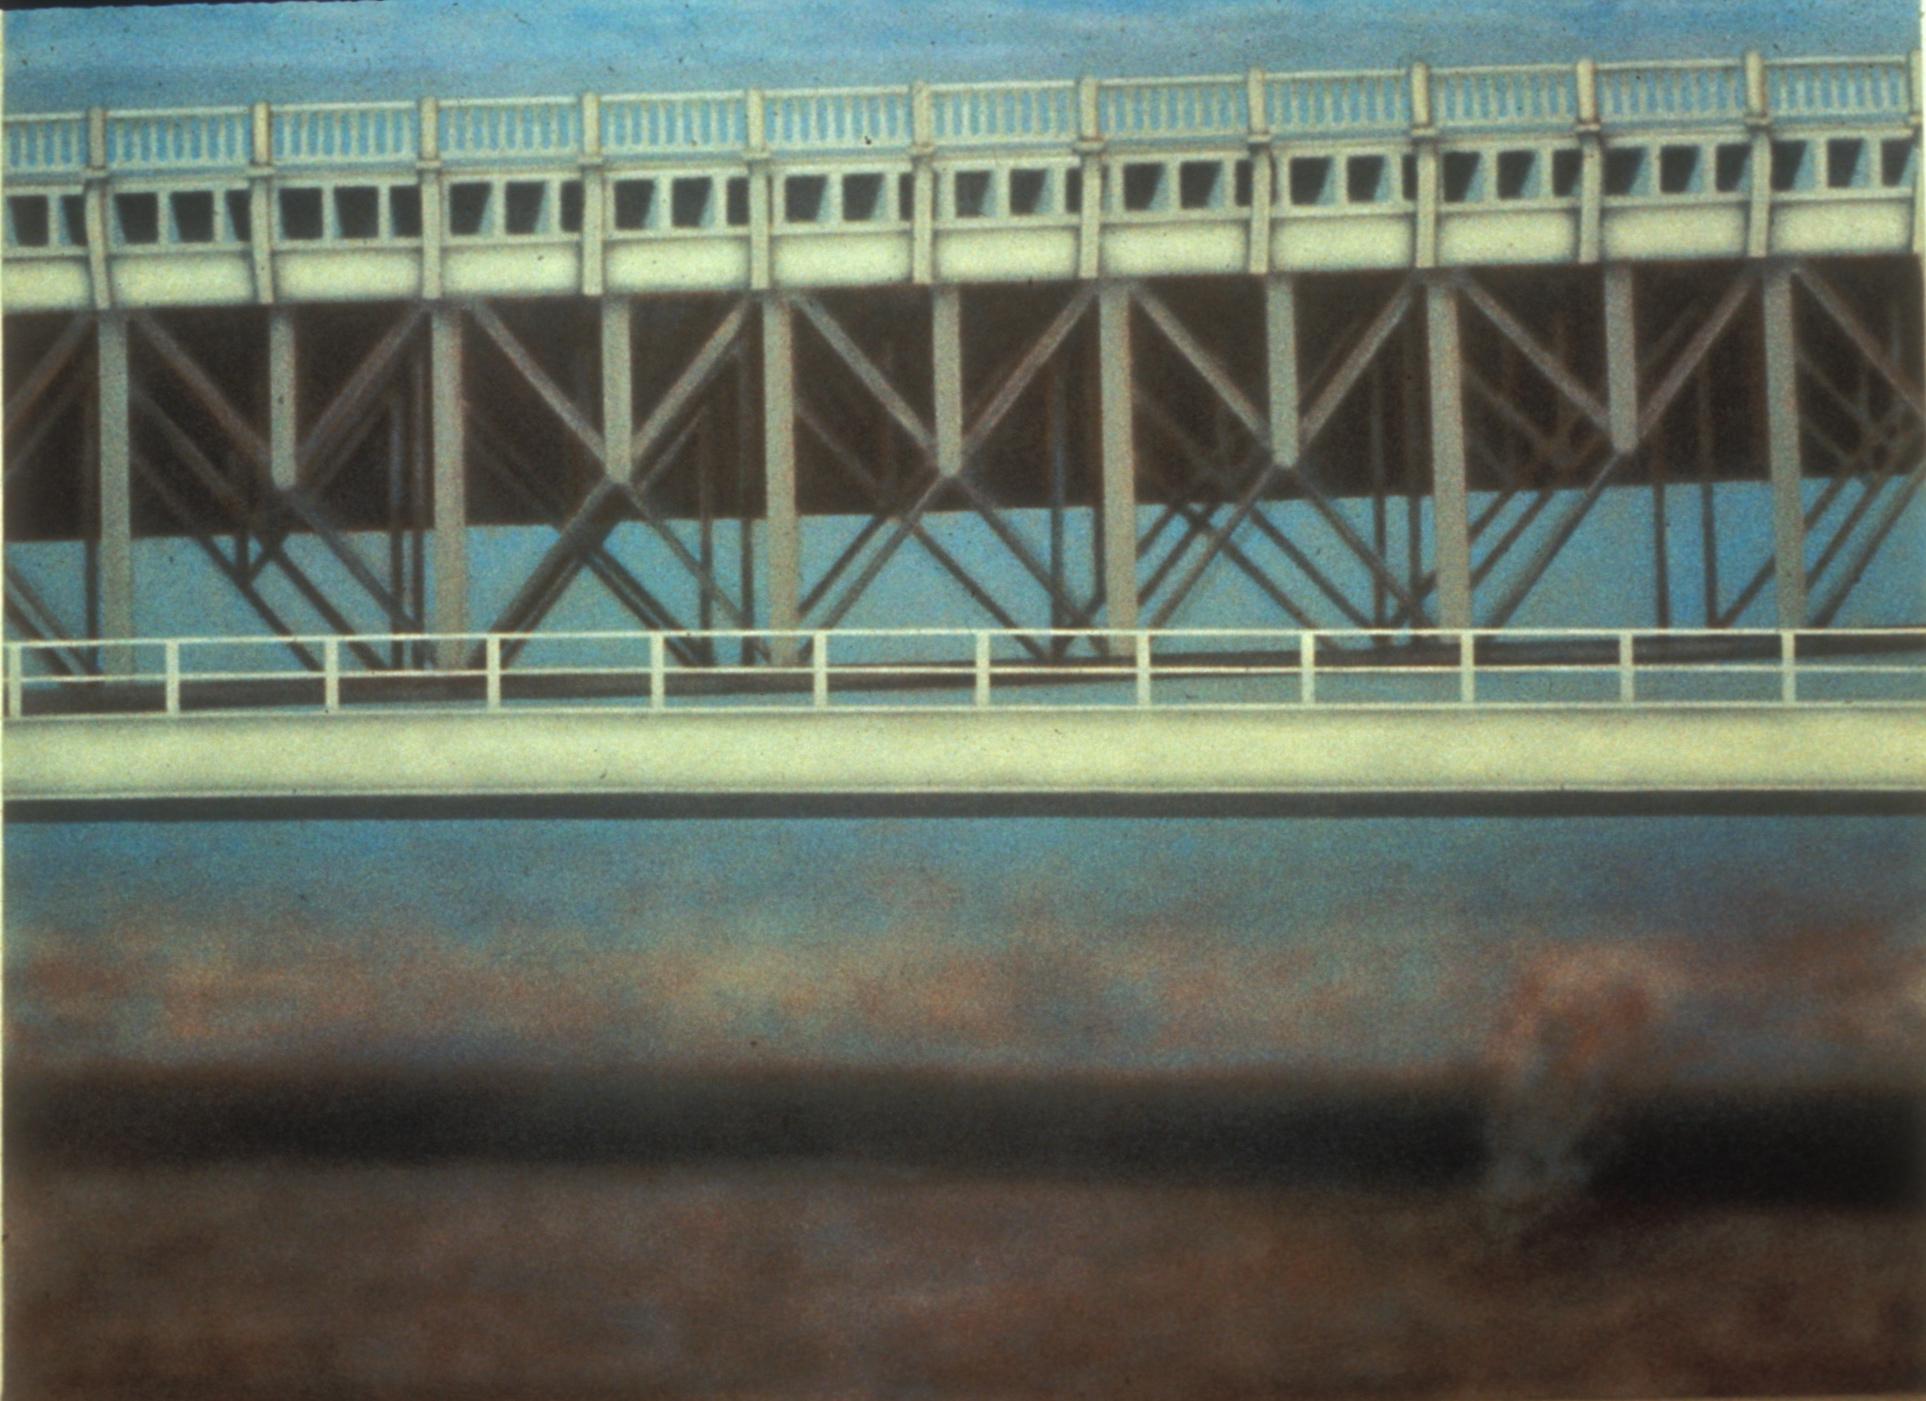 V. Pearl Street Underpass   7' x 10' ac/c